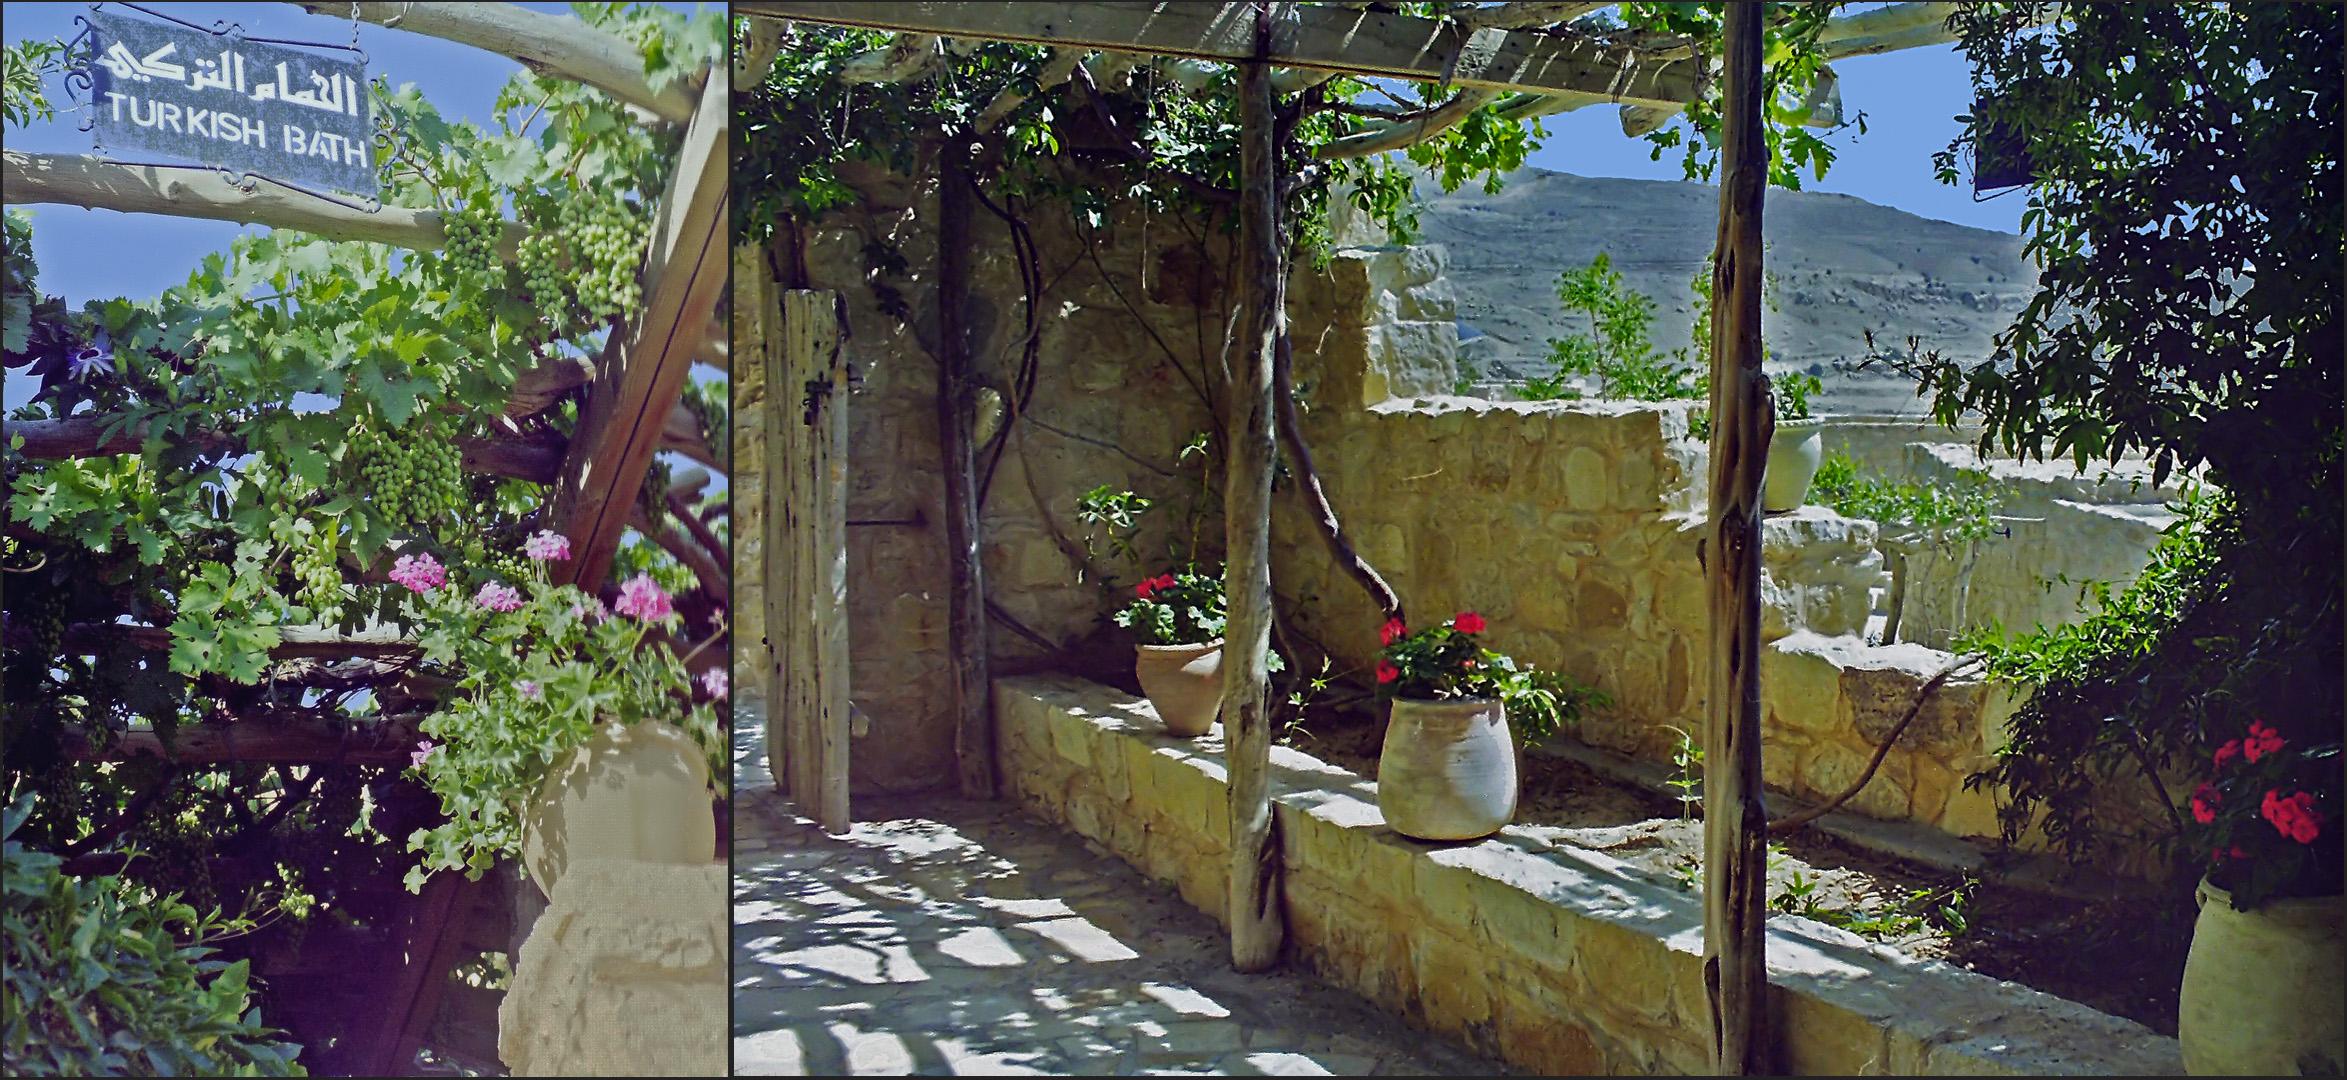 Entrée et jardin du Bain Turc (Hammam)